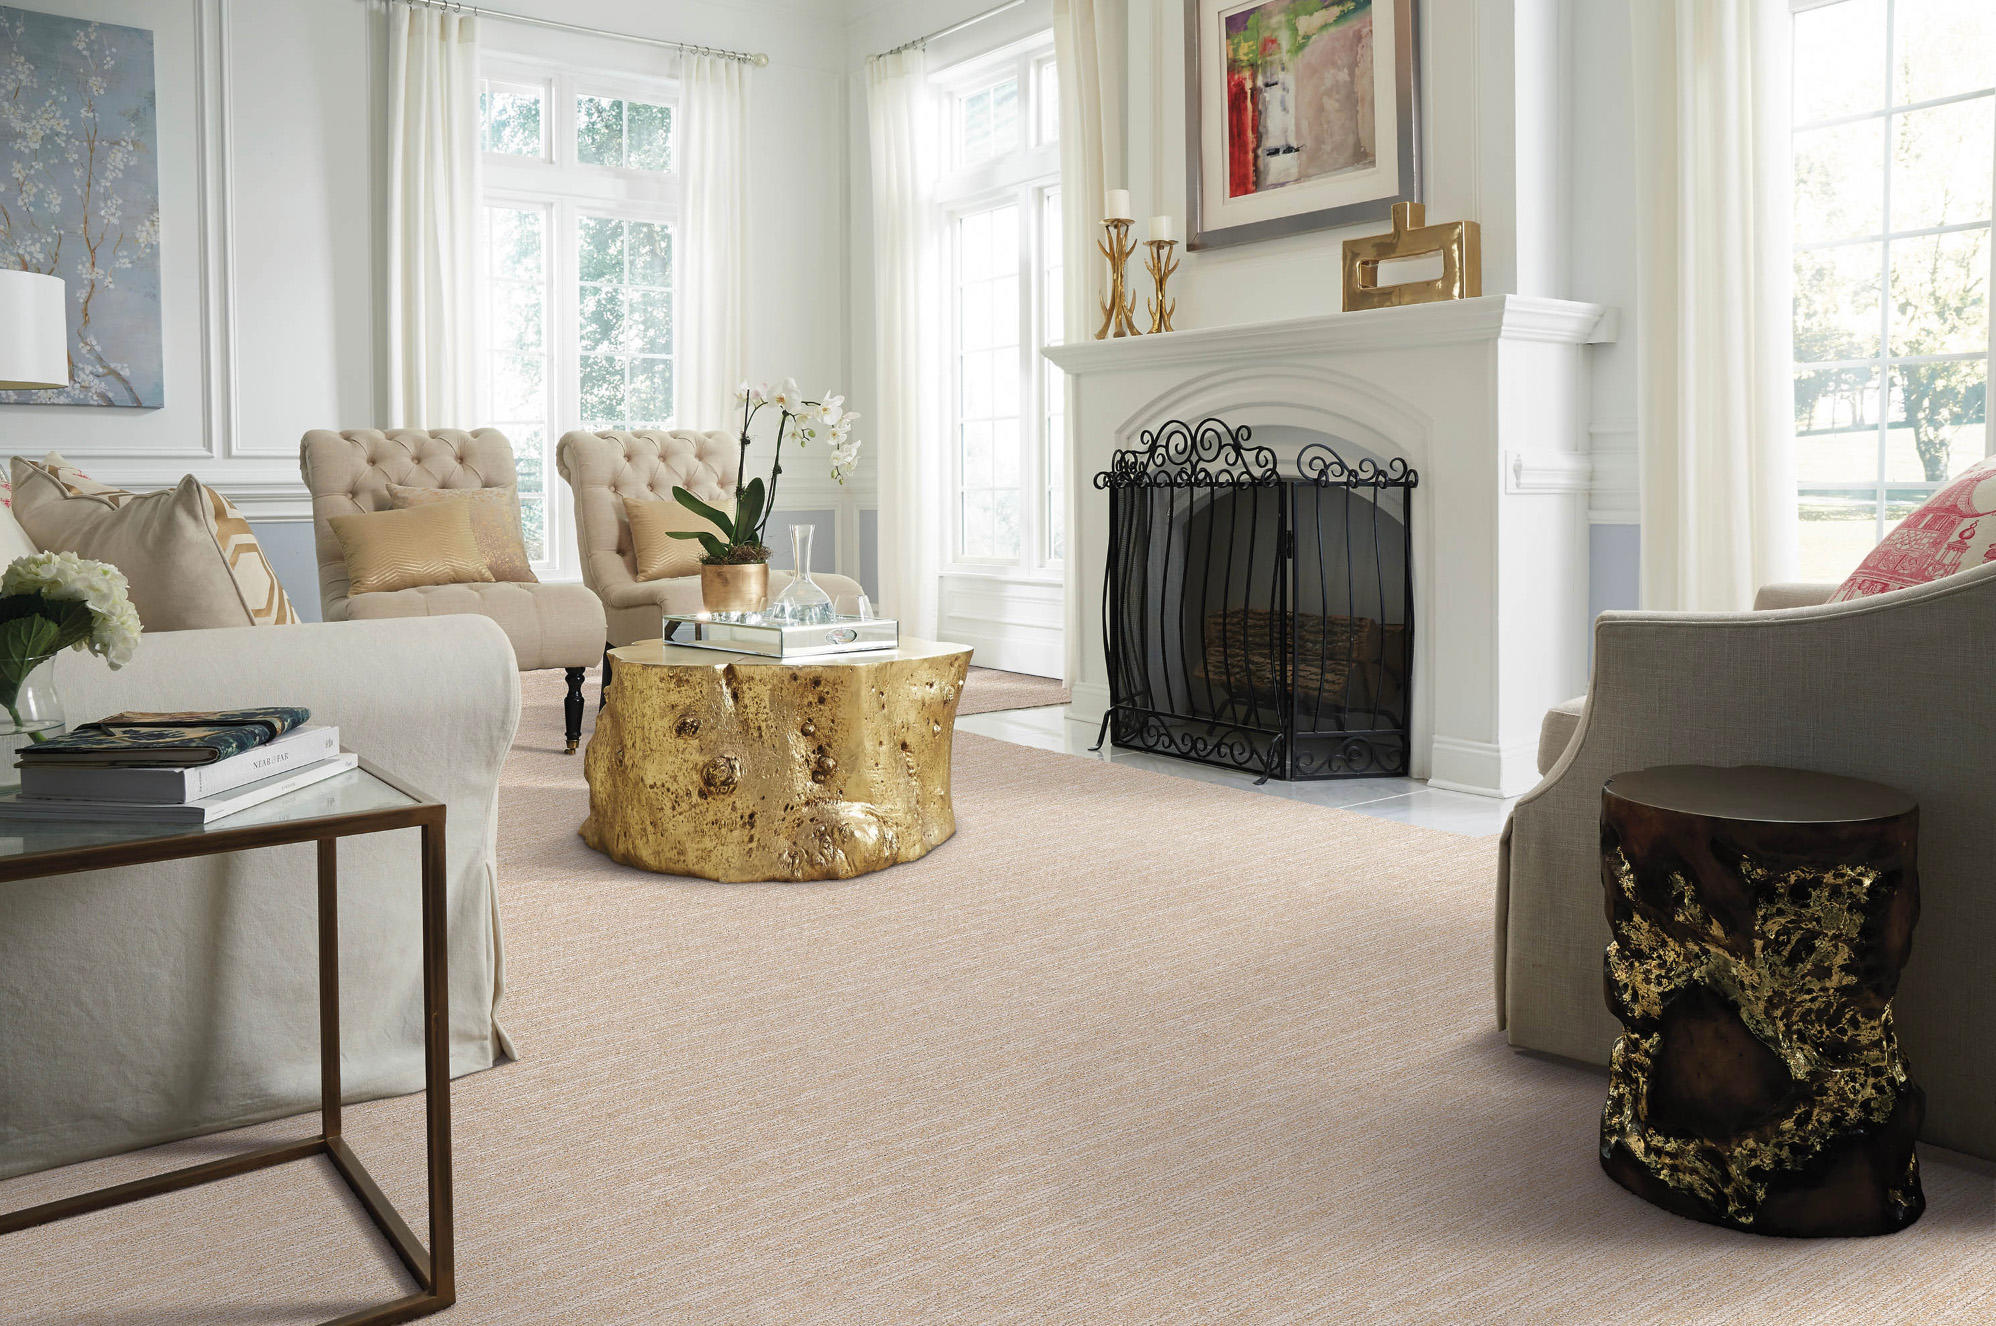 Avalon Flooring image 3